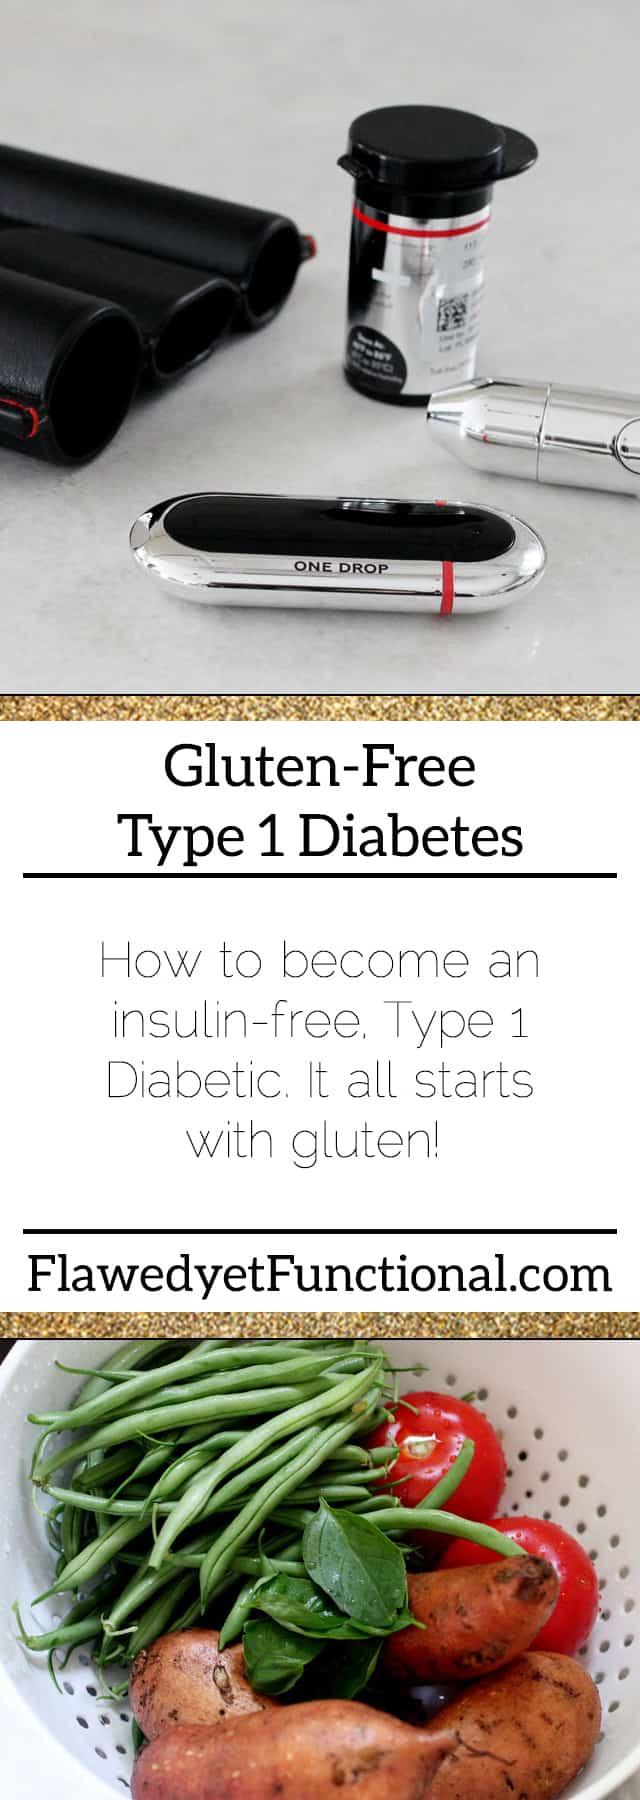 Gluten-free type 1 diabetes